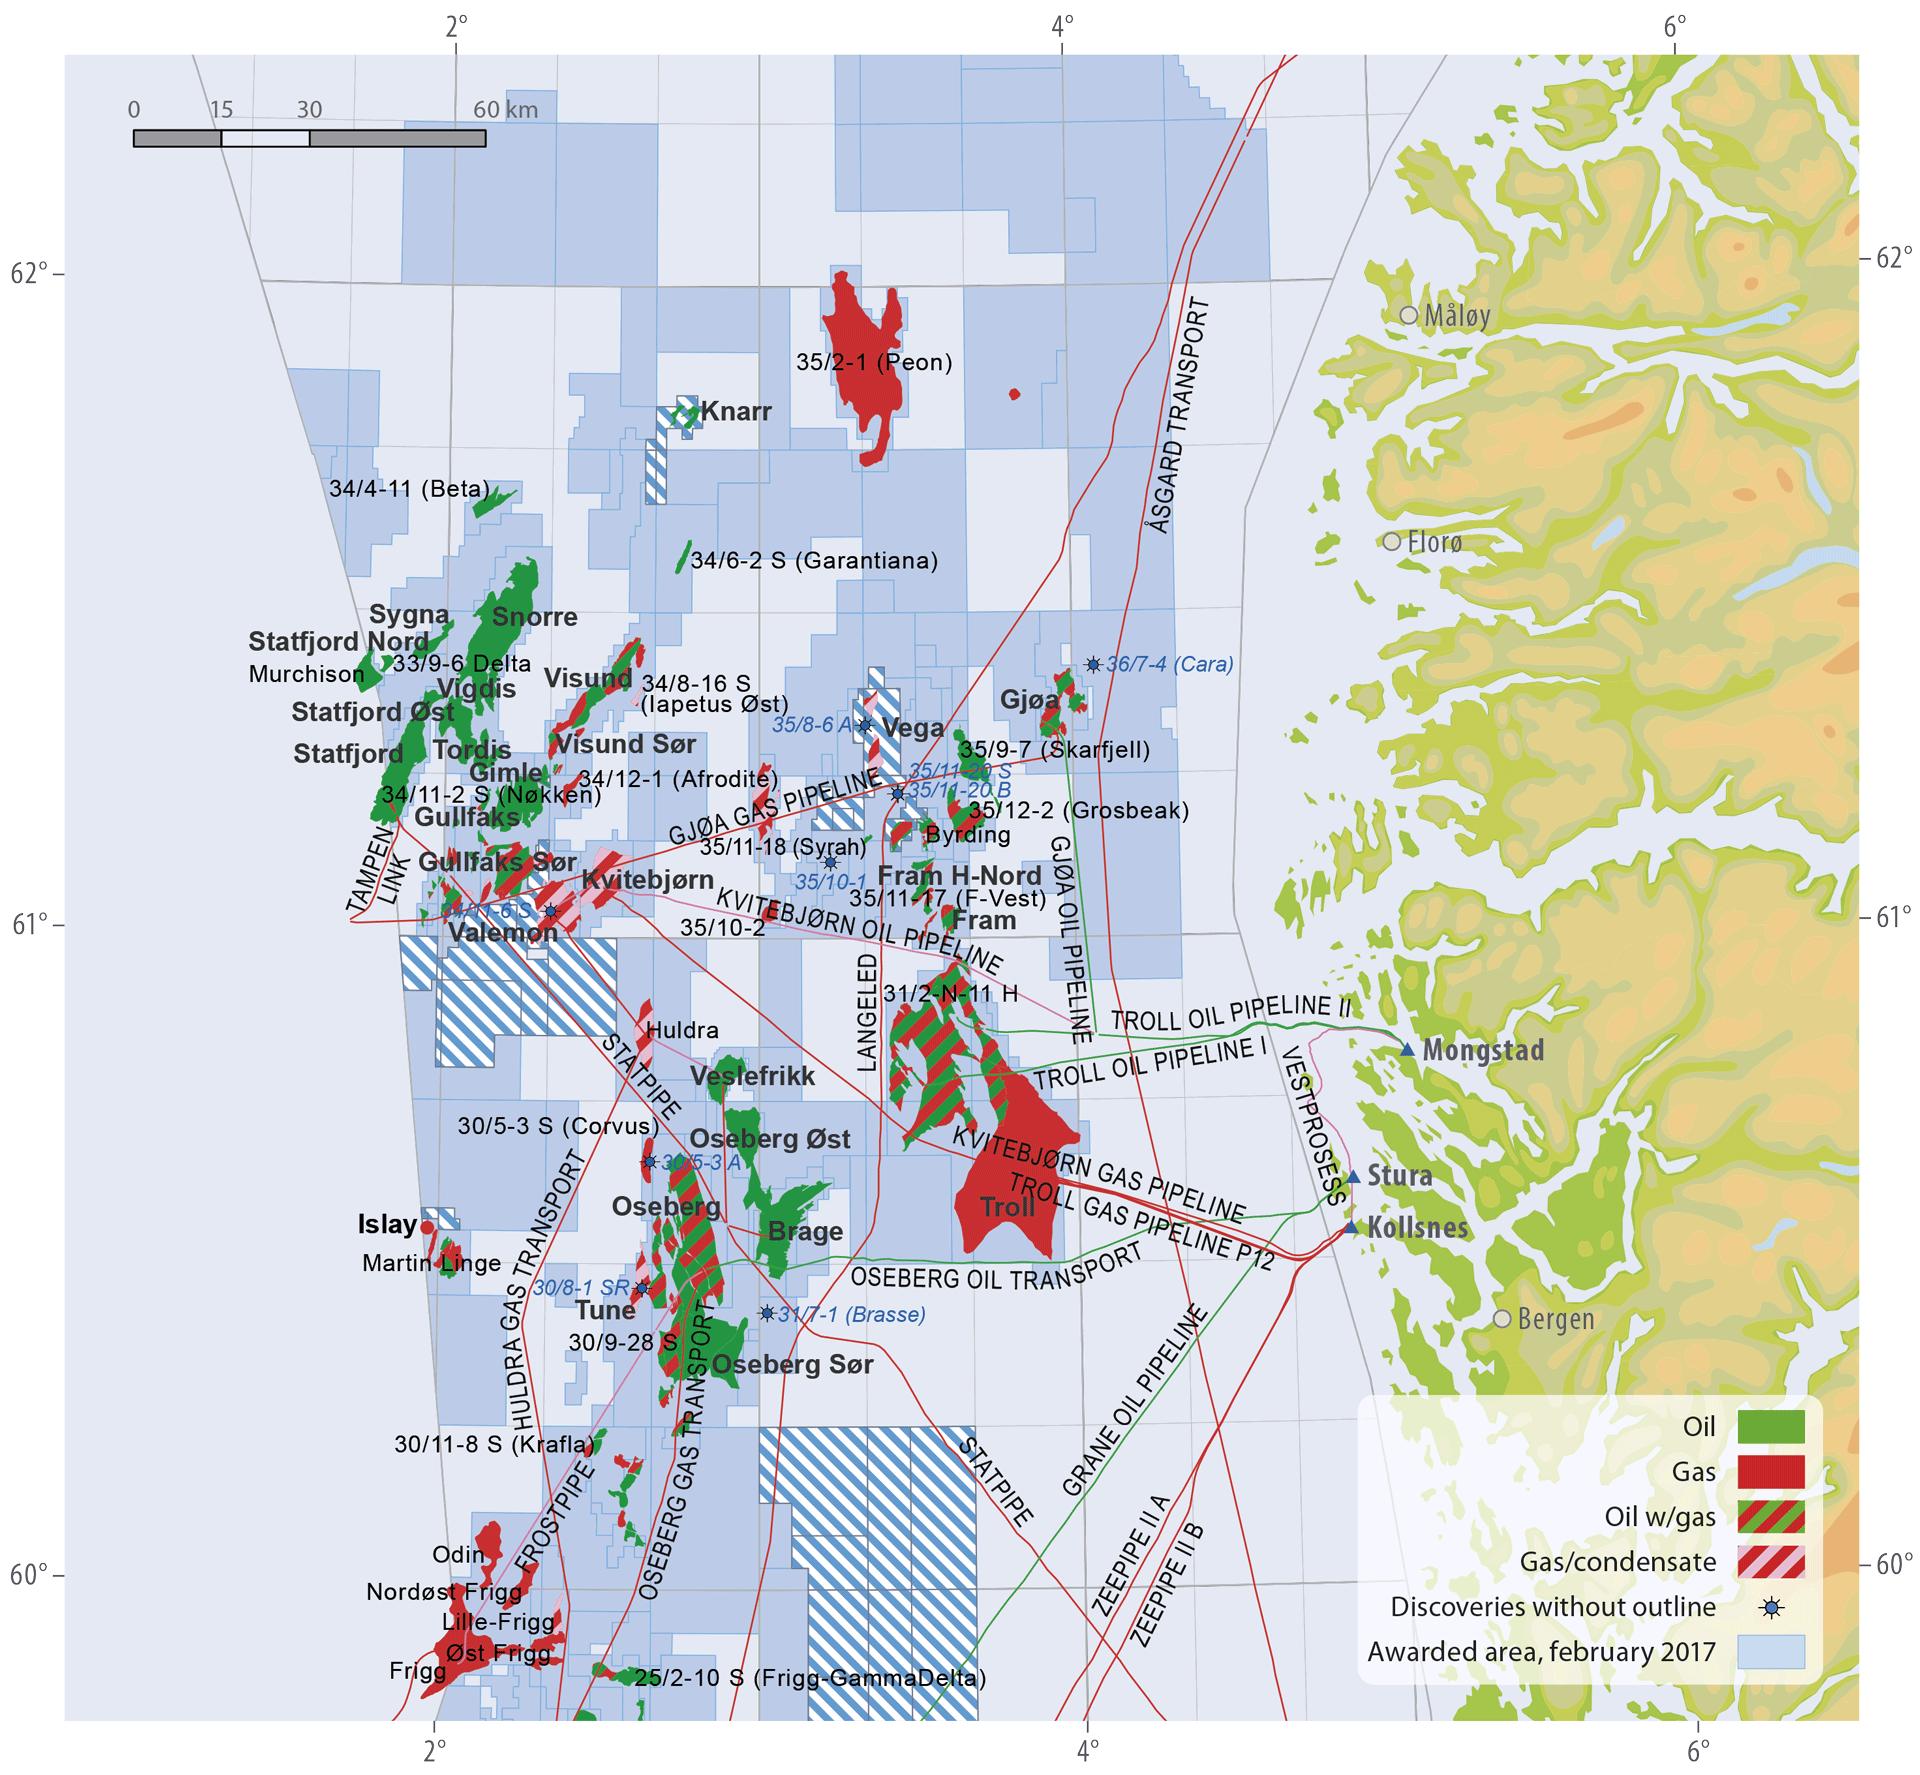 Polarkreis Alaska Karte.Norwegens Erdöl Der Anfang Vom Ende Einer ära Telepolis